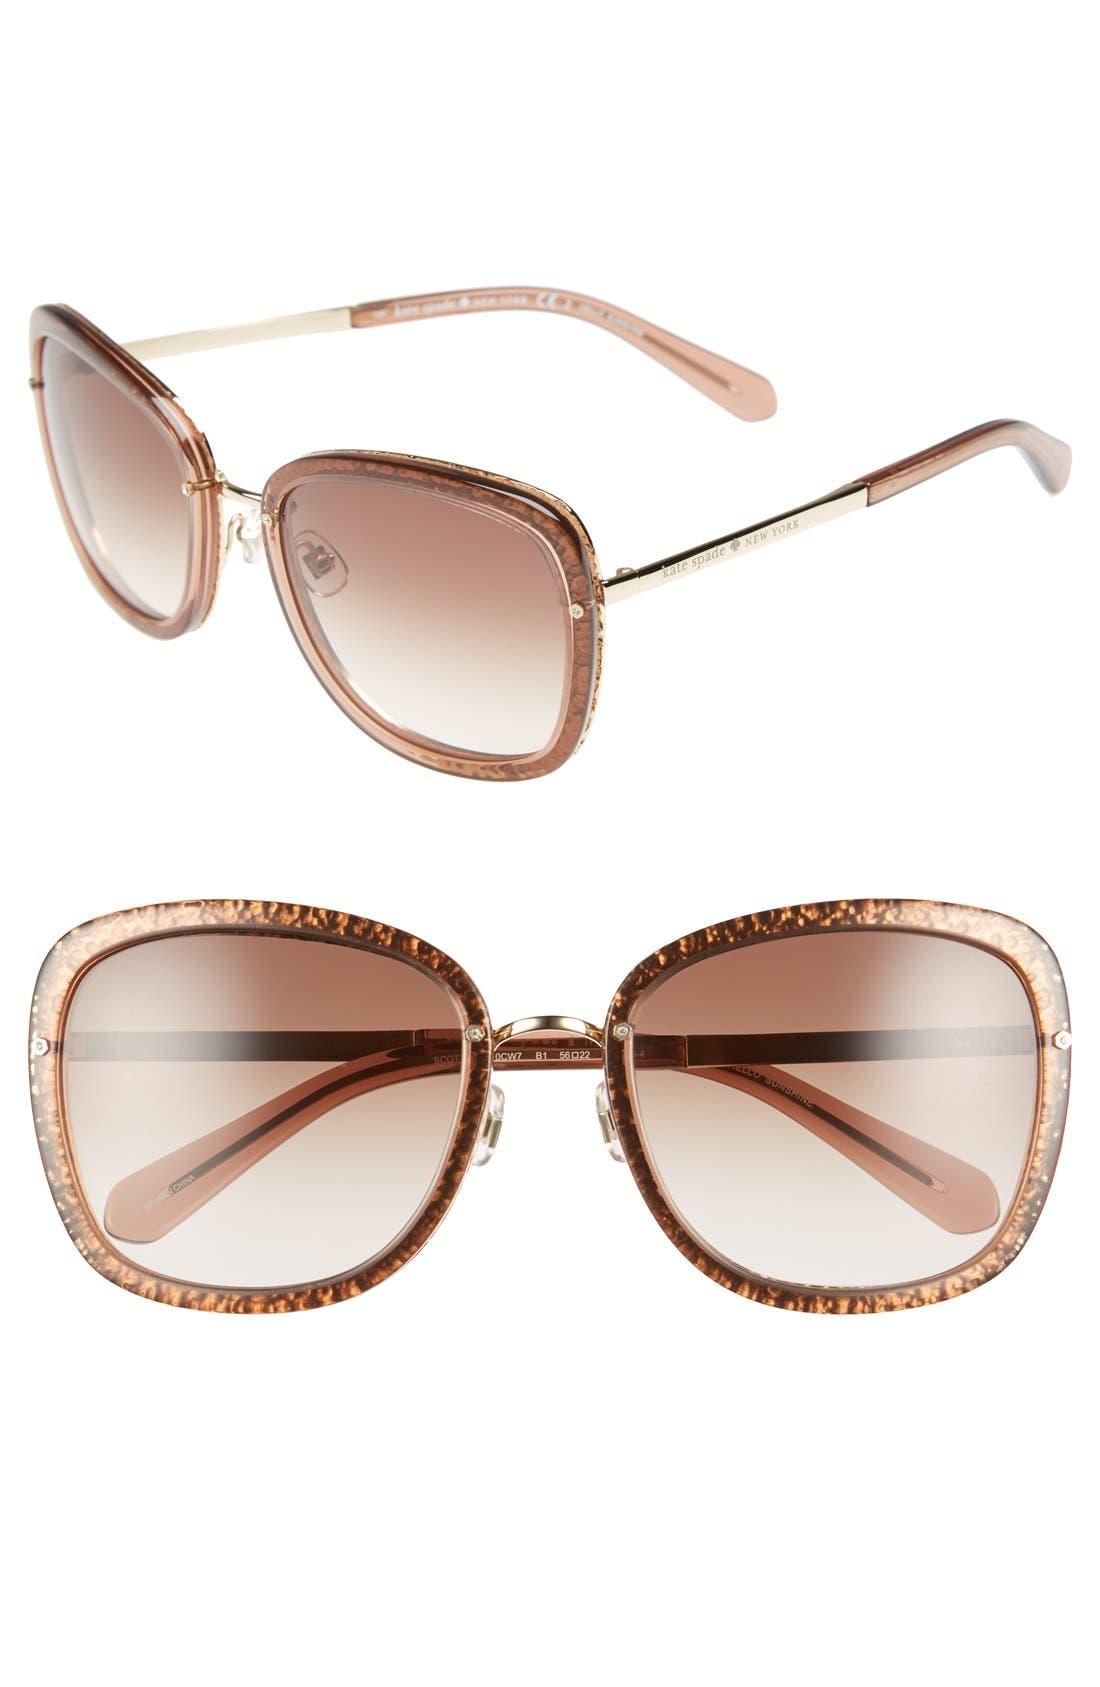 KATE SPADE NEW YORK,                             'scottie' 56mm retro sunglasses,                             Main thumbnail 1, color,                             200